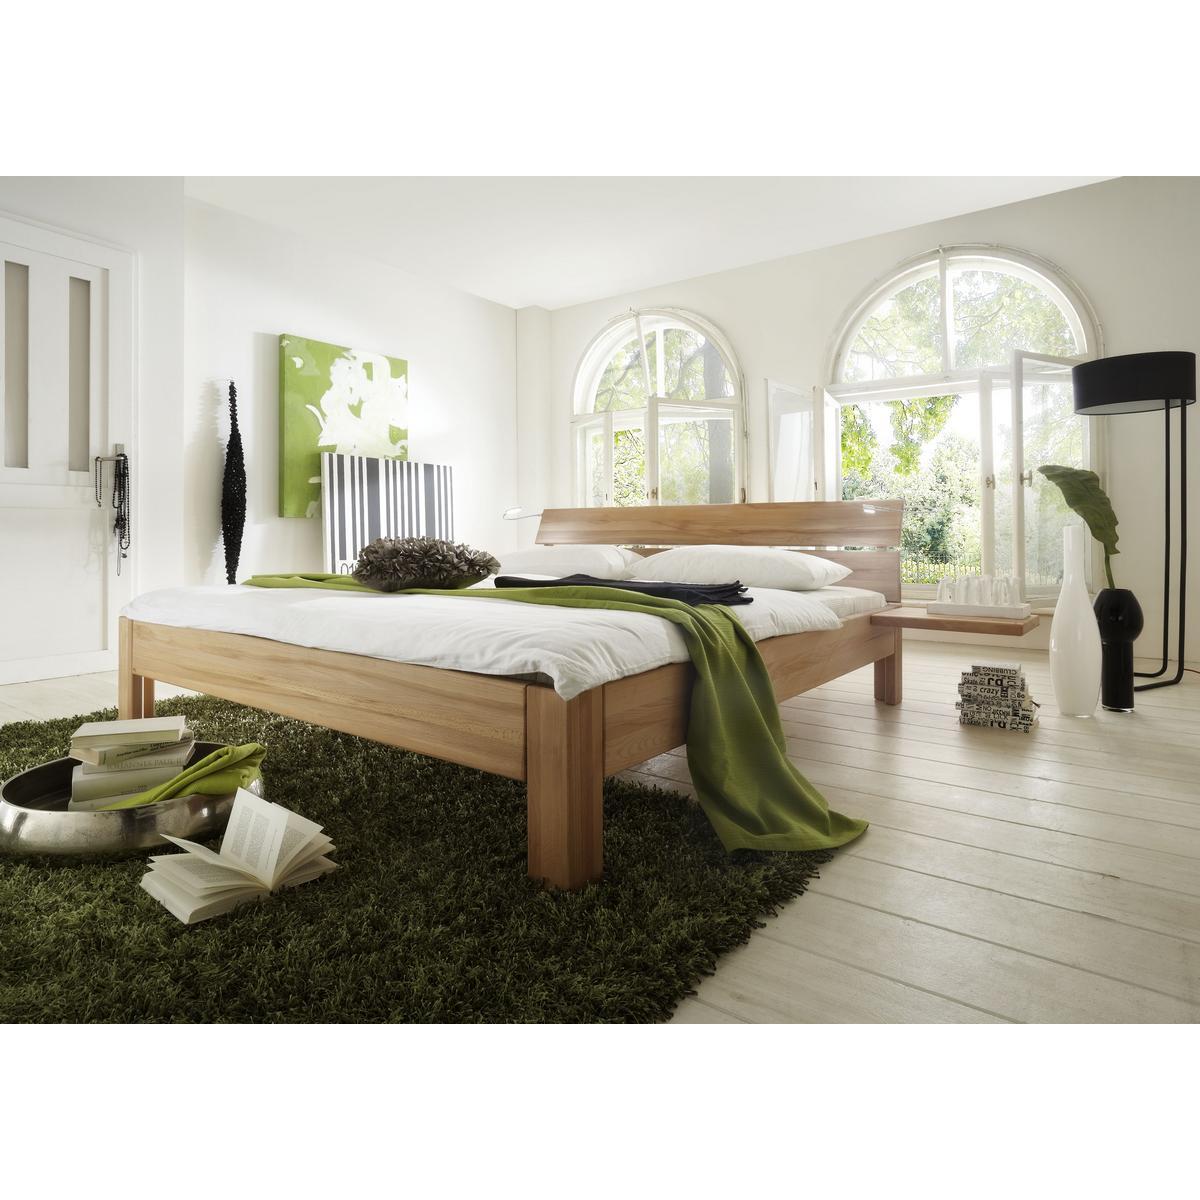 Massivholz bett 120x200 xl easy sleep kernbuche massiv for Einzelbett 120x200